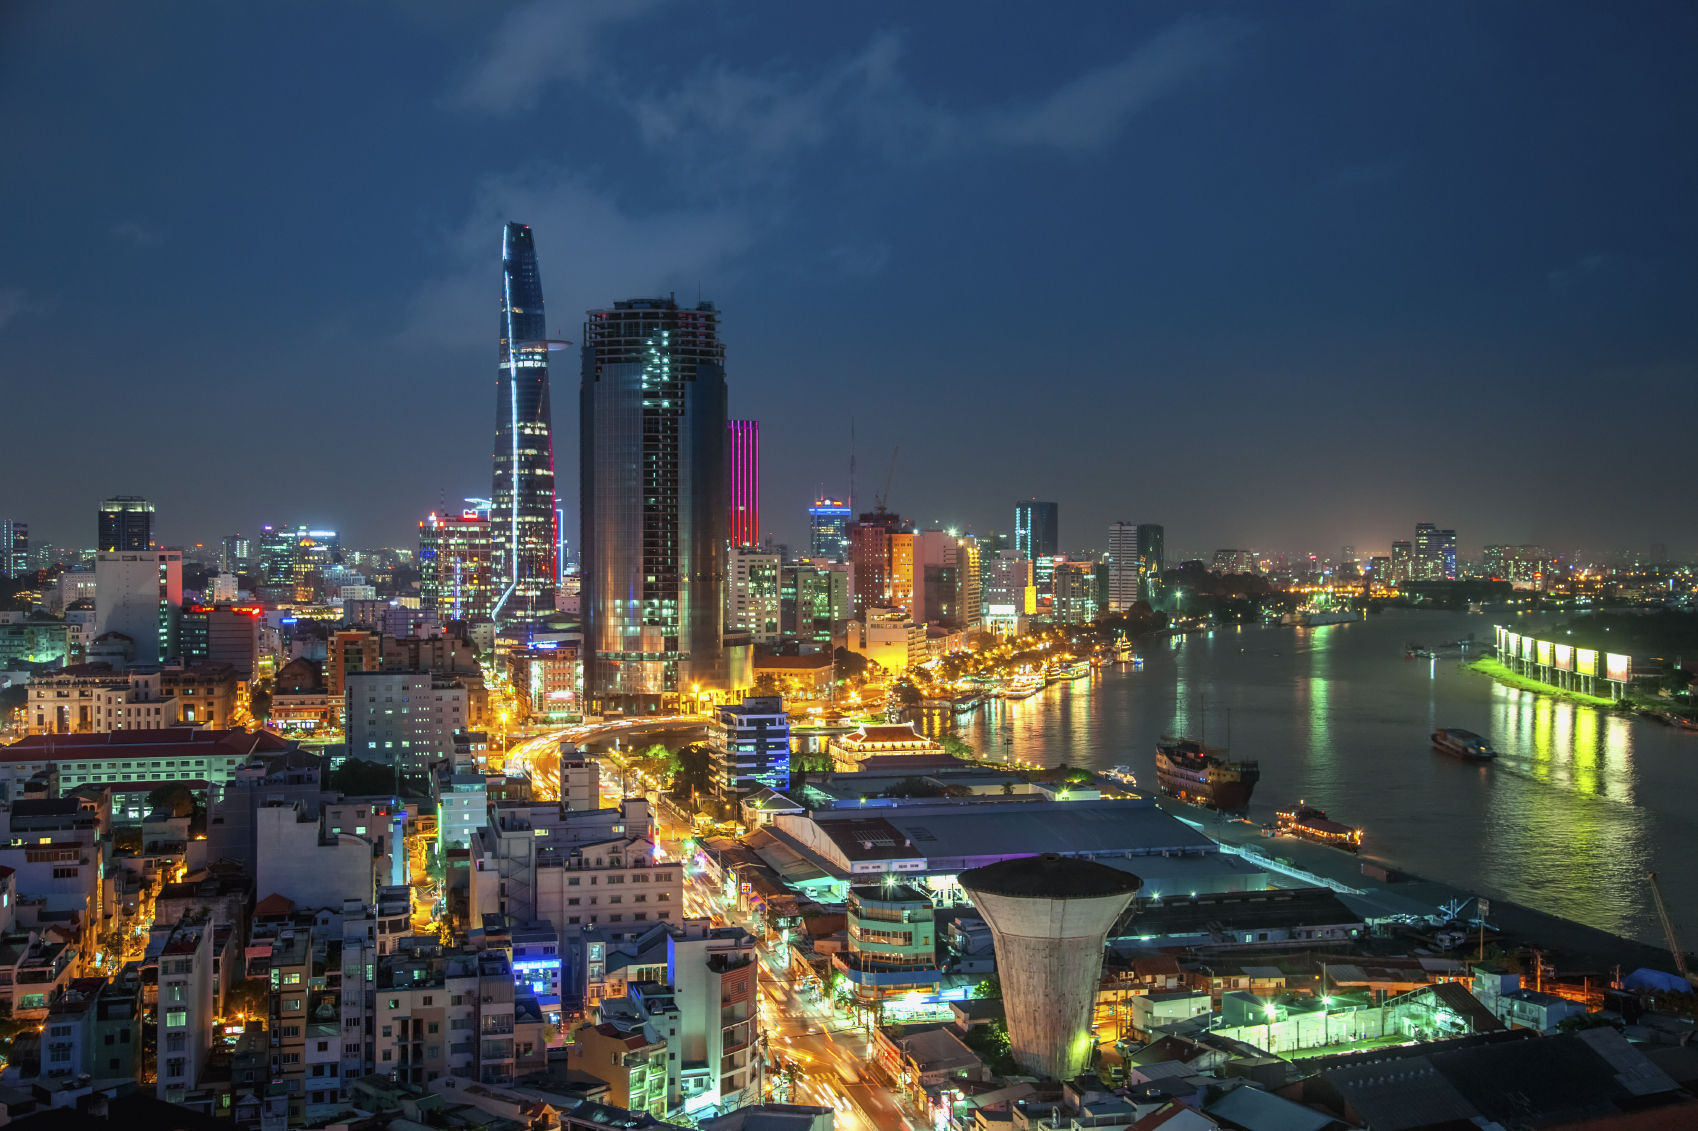 ¿A qué país pertenece Ho Chi Minh City?